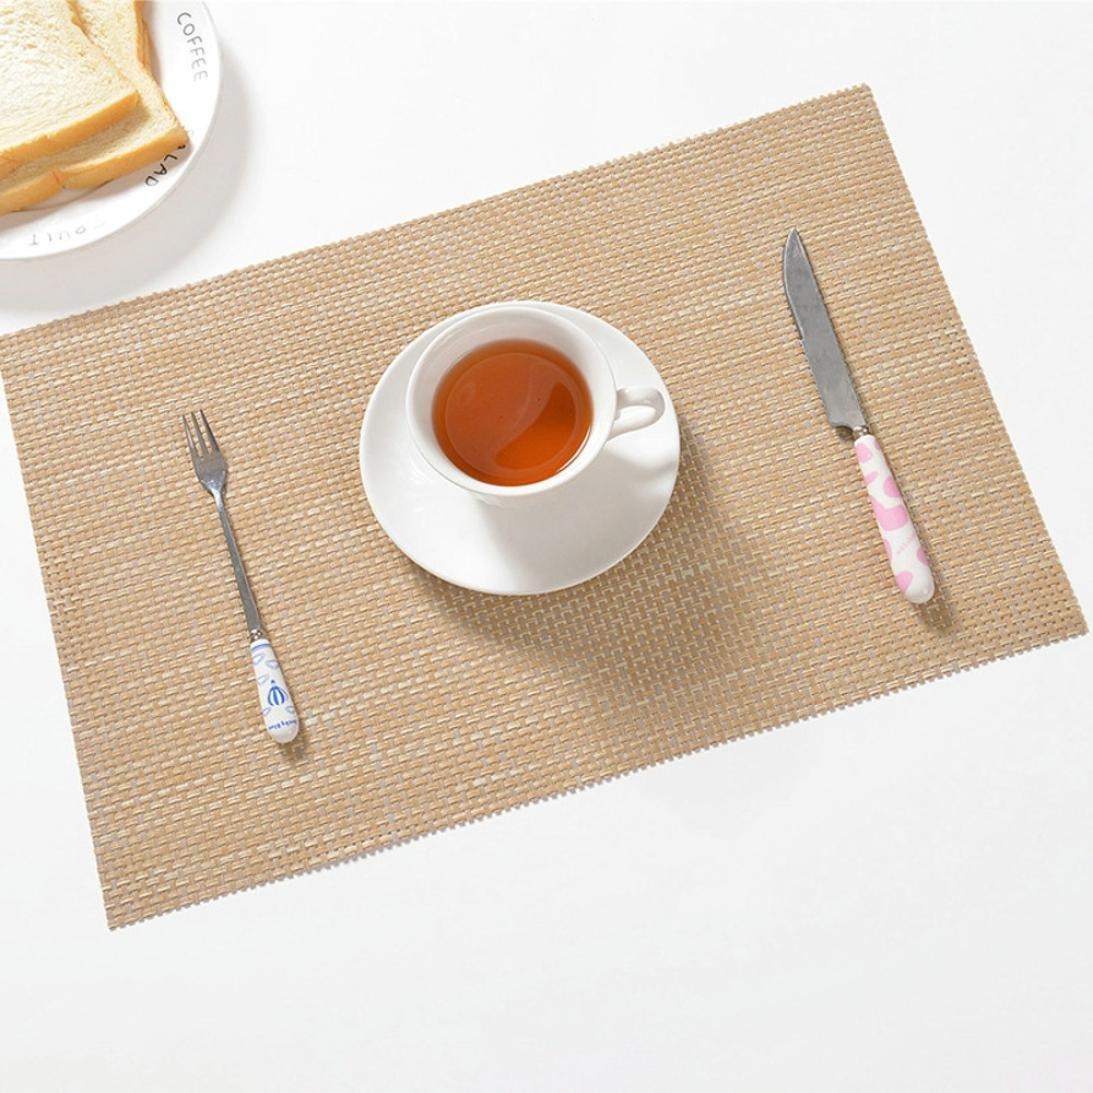 YJYdada Mat,Non-slip Heat Desktop Decoration Modern Waterproof Western Food Mat (Beige)